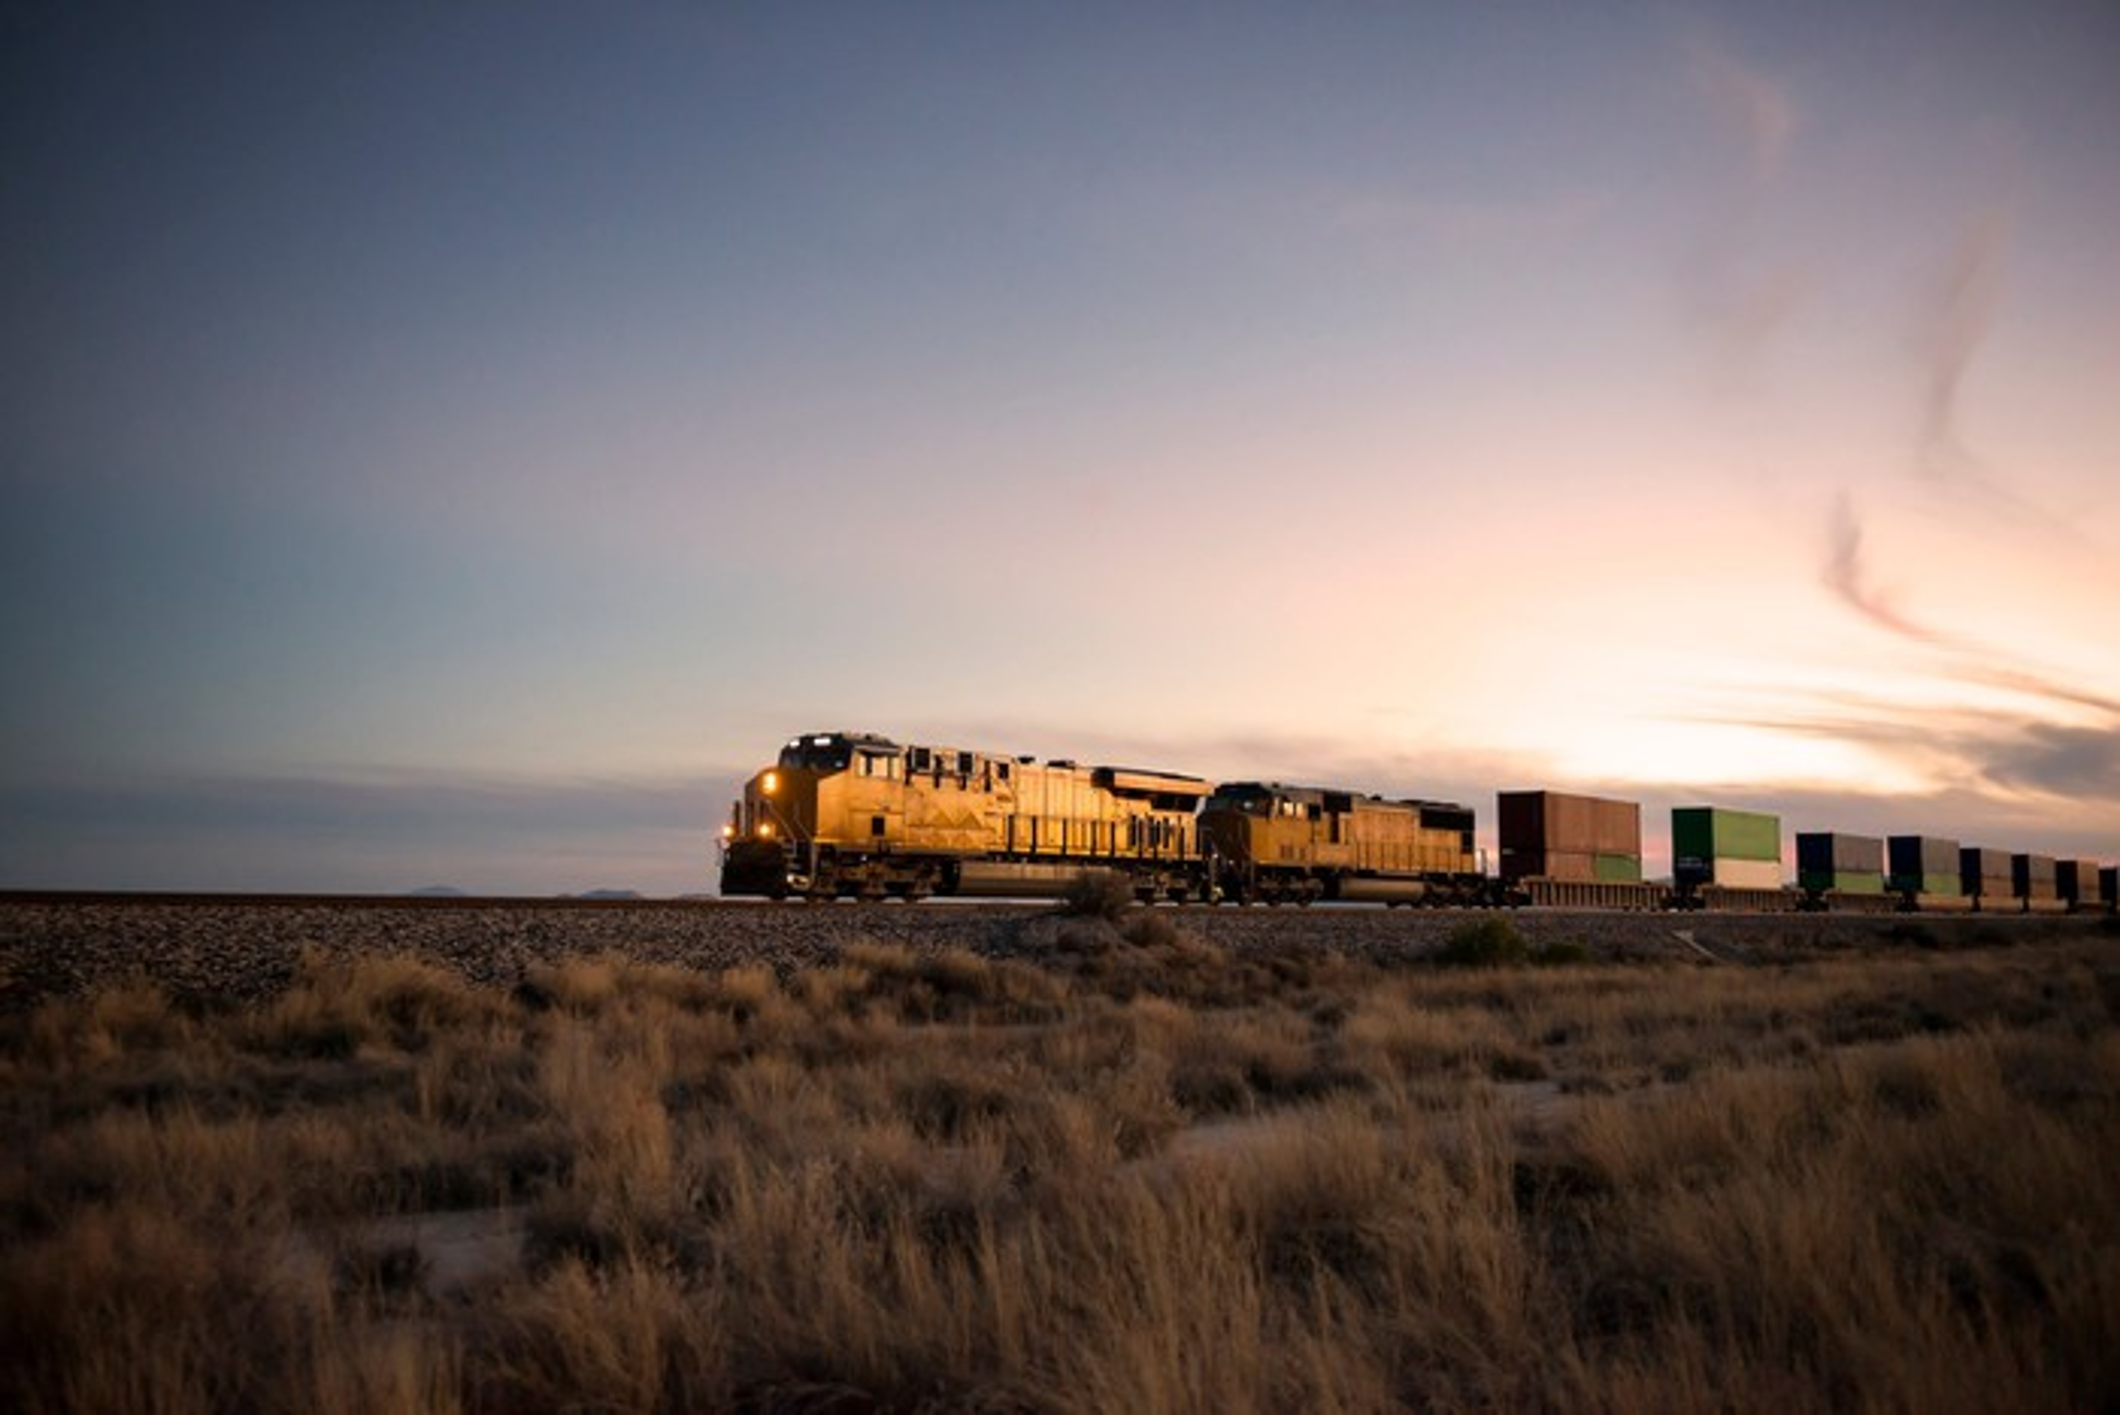 Locomotive at dusk.